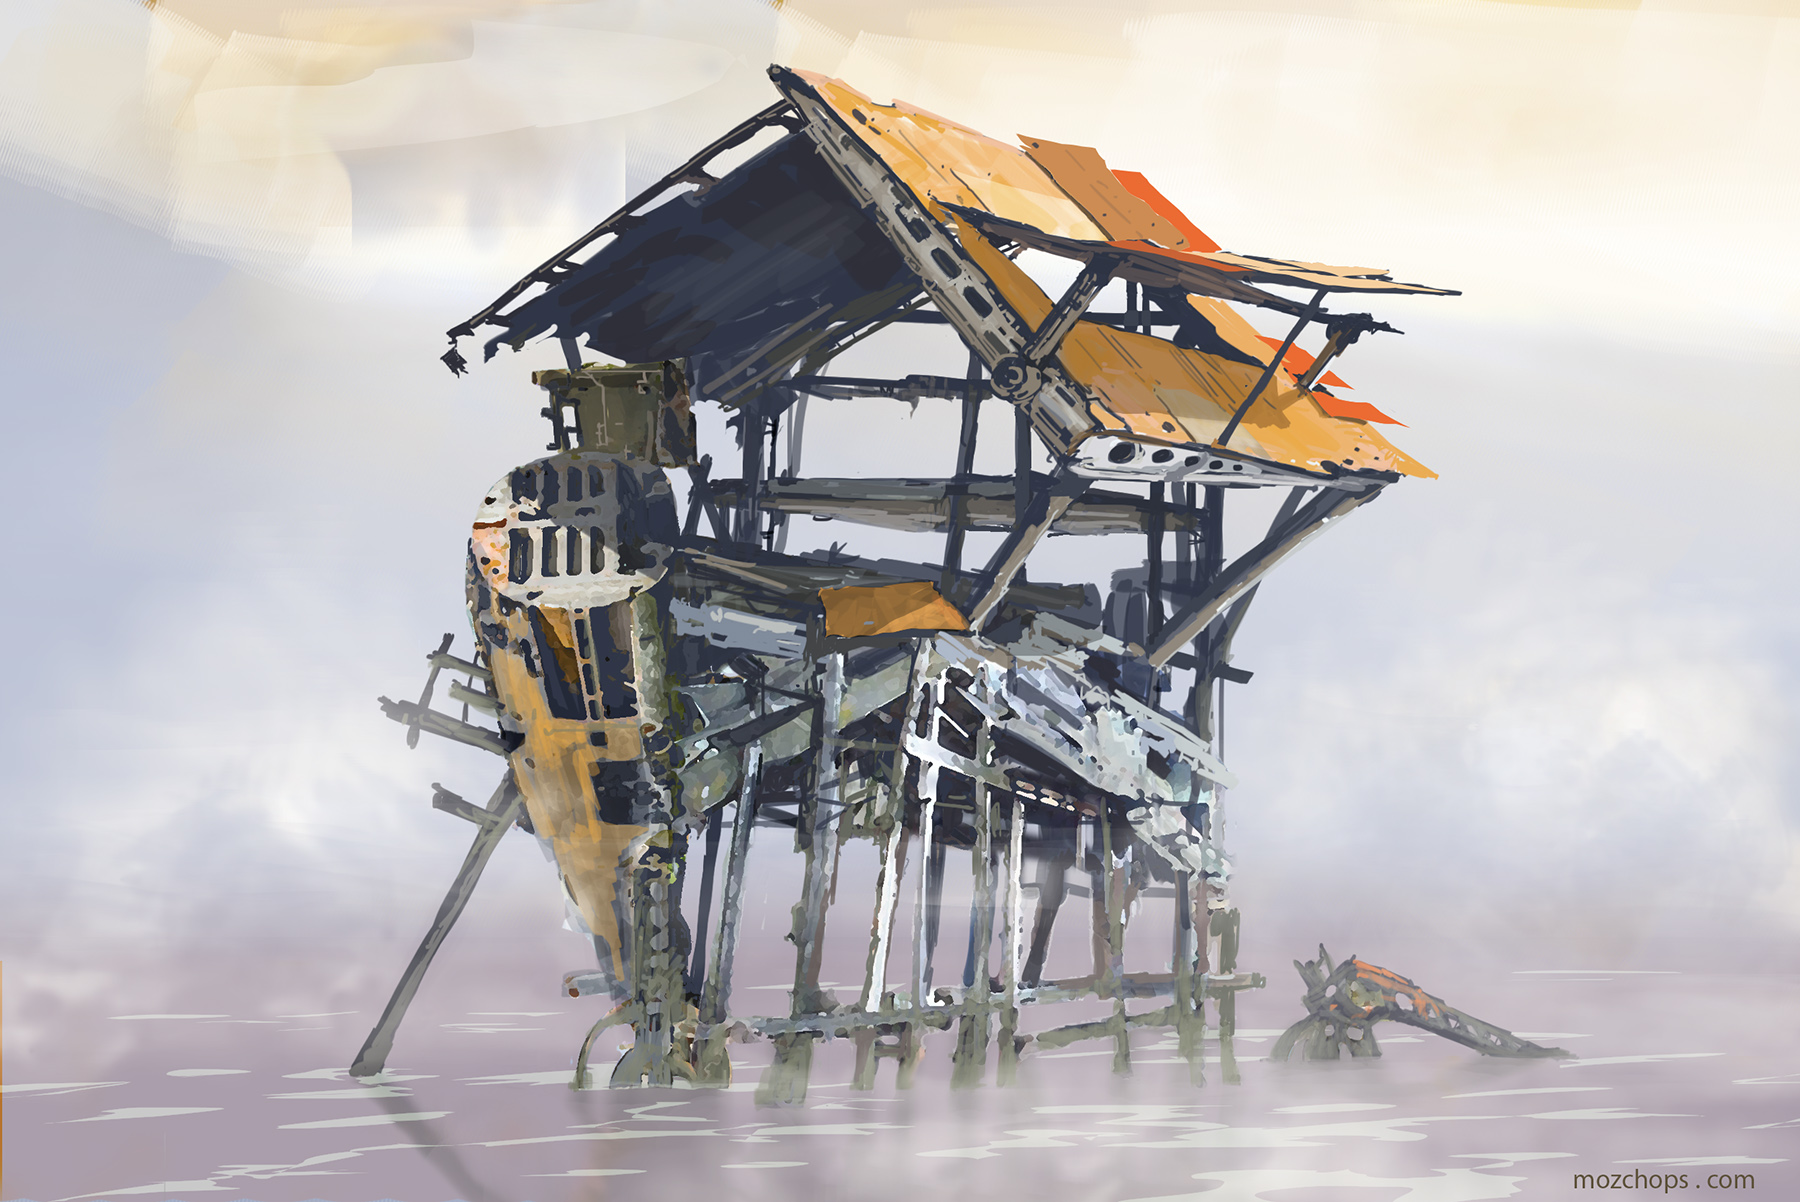 Junk shanty 02 by Mozchops